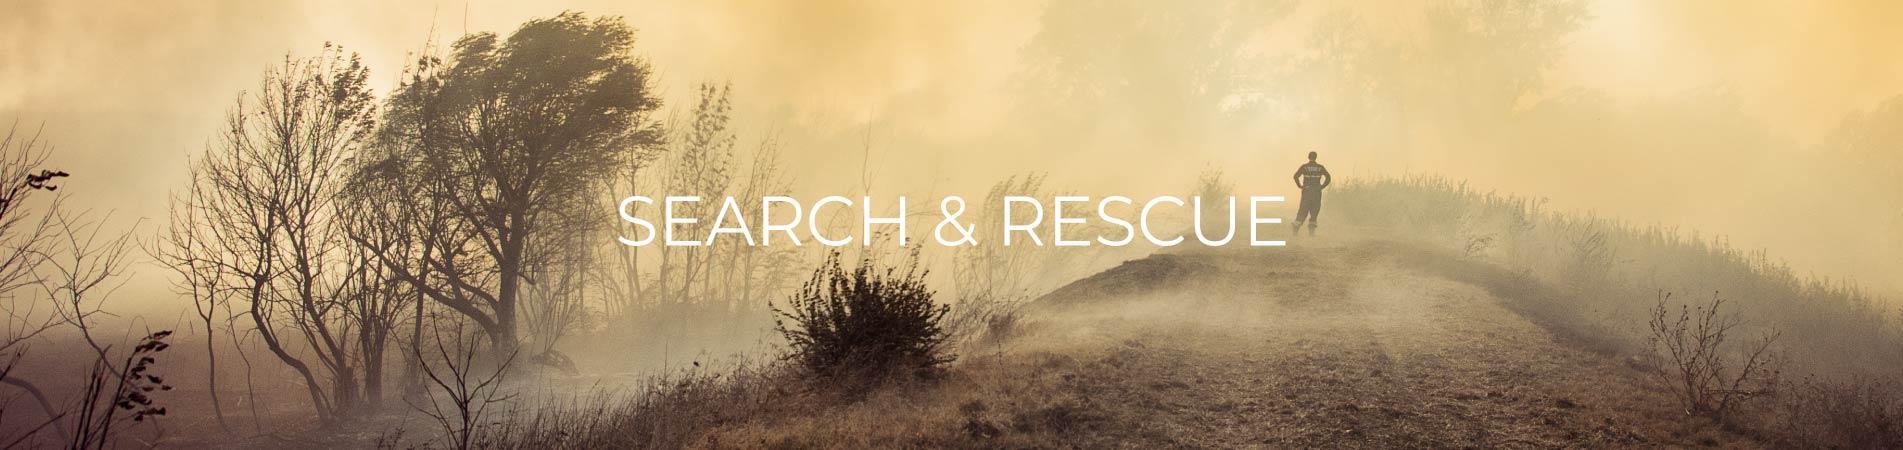 search-rescue-banner.jpg